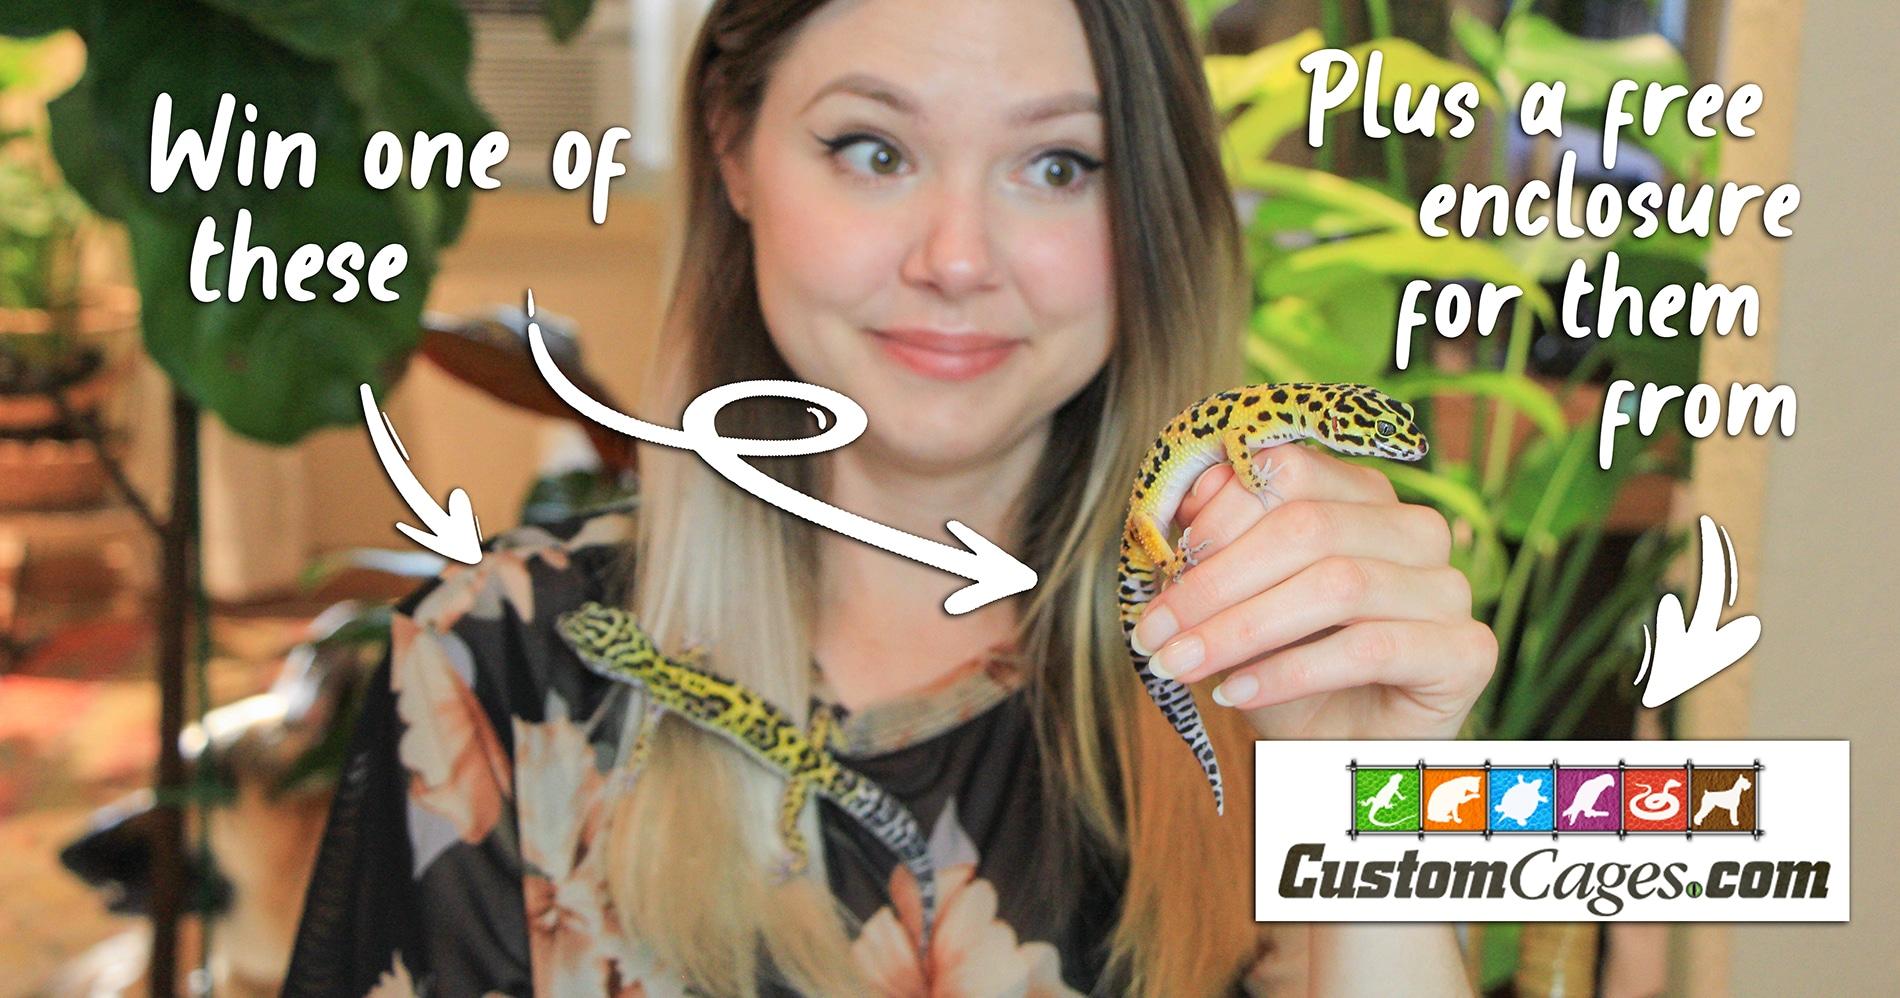 Jennifer Lynx & Custom Cages Leopard Gecko Giveaway Giveaway Image